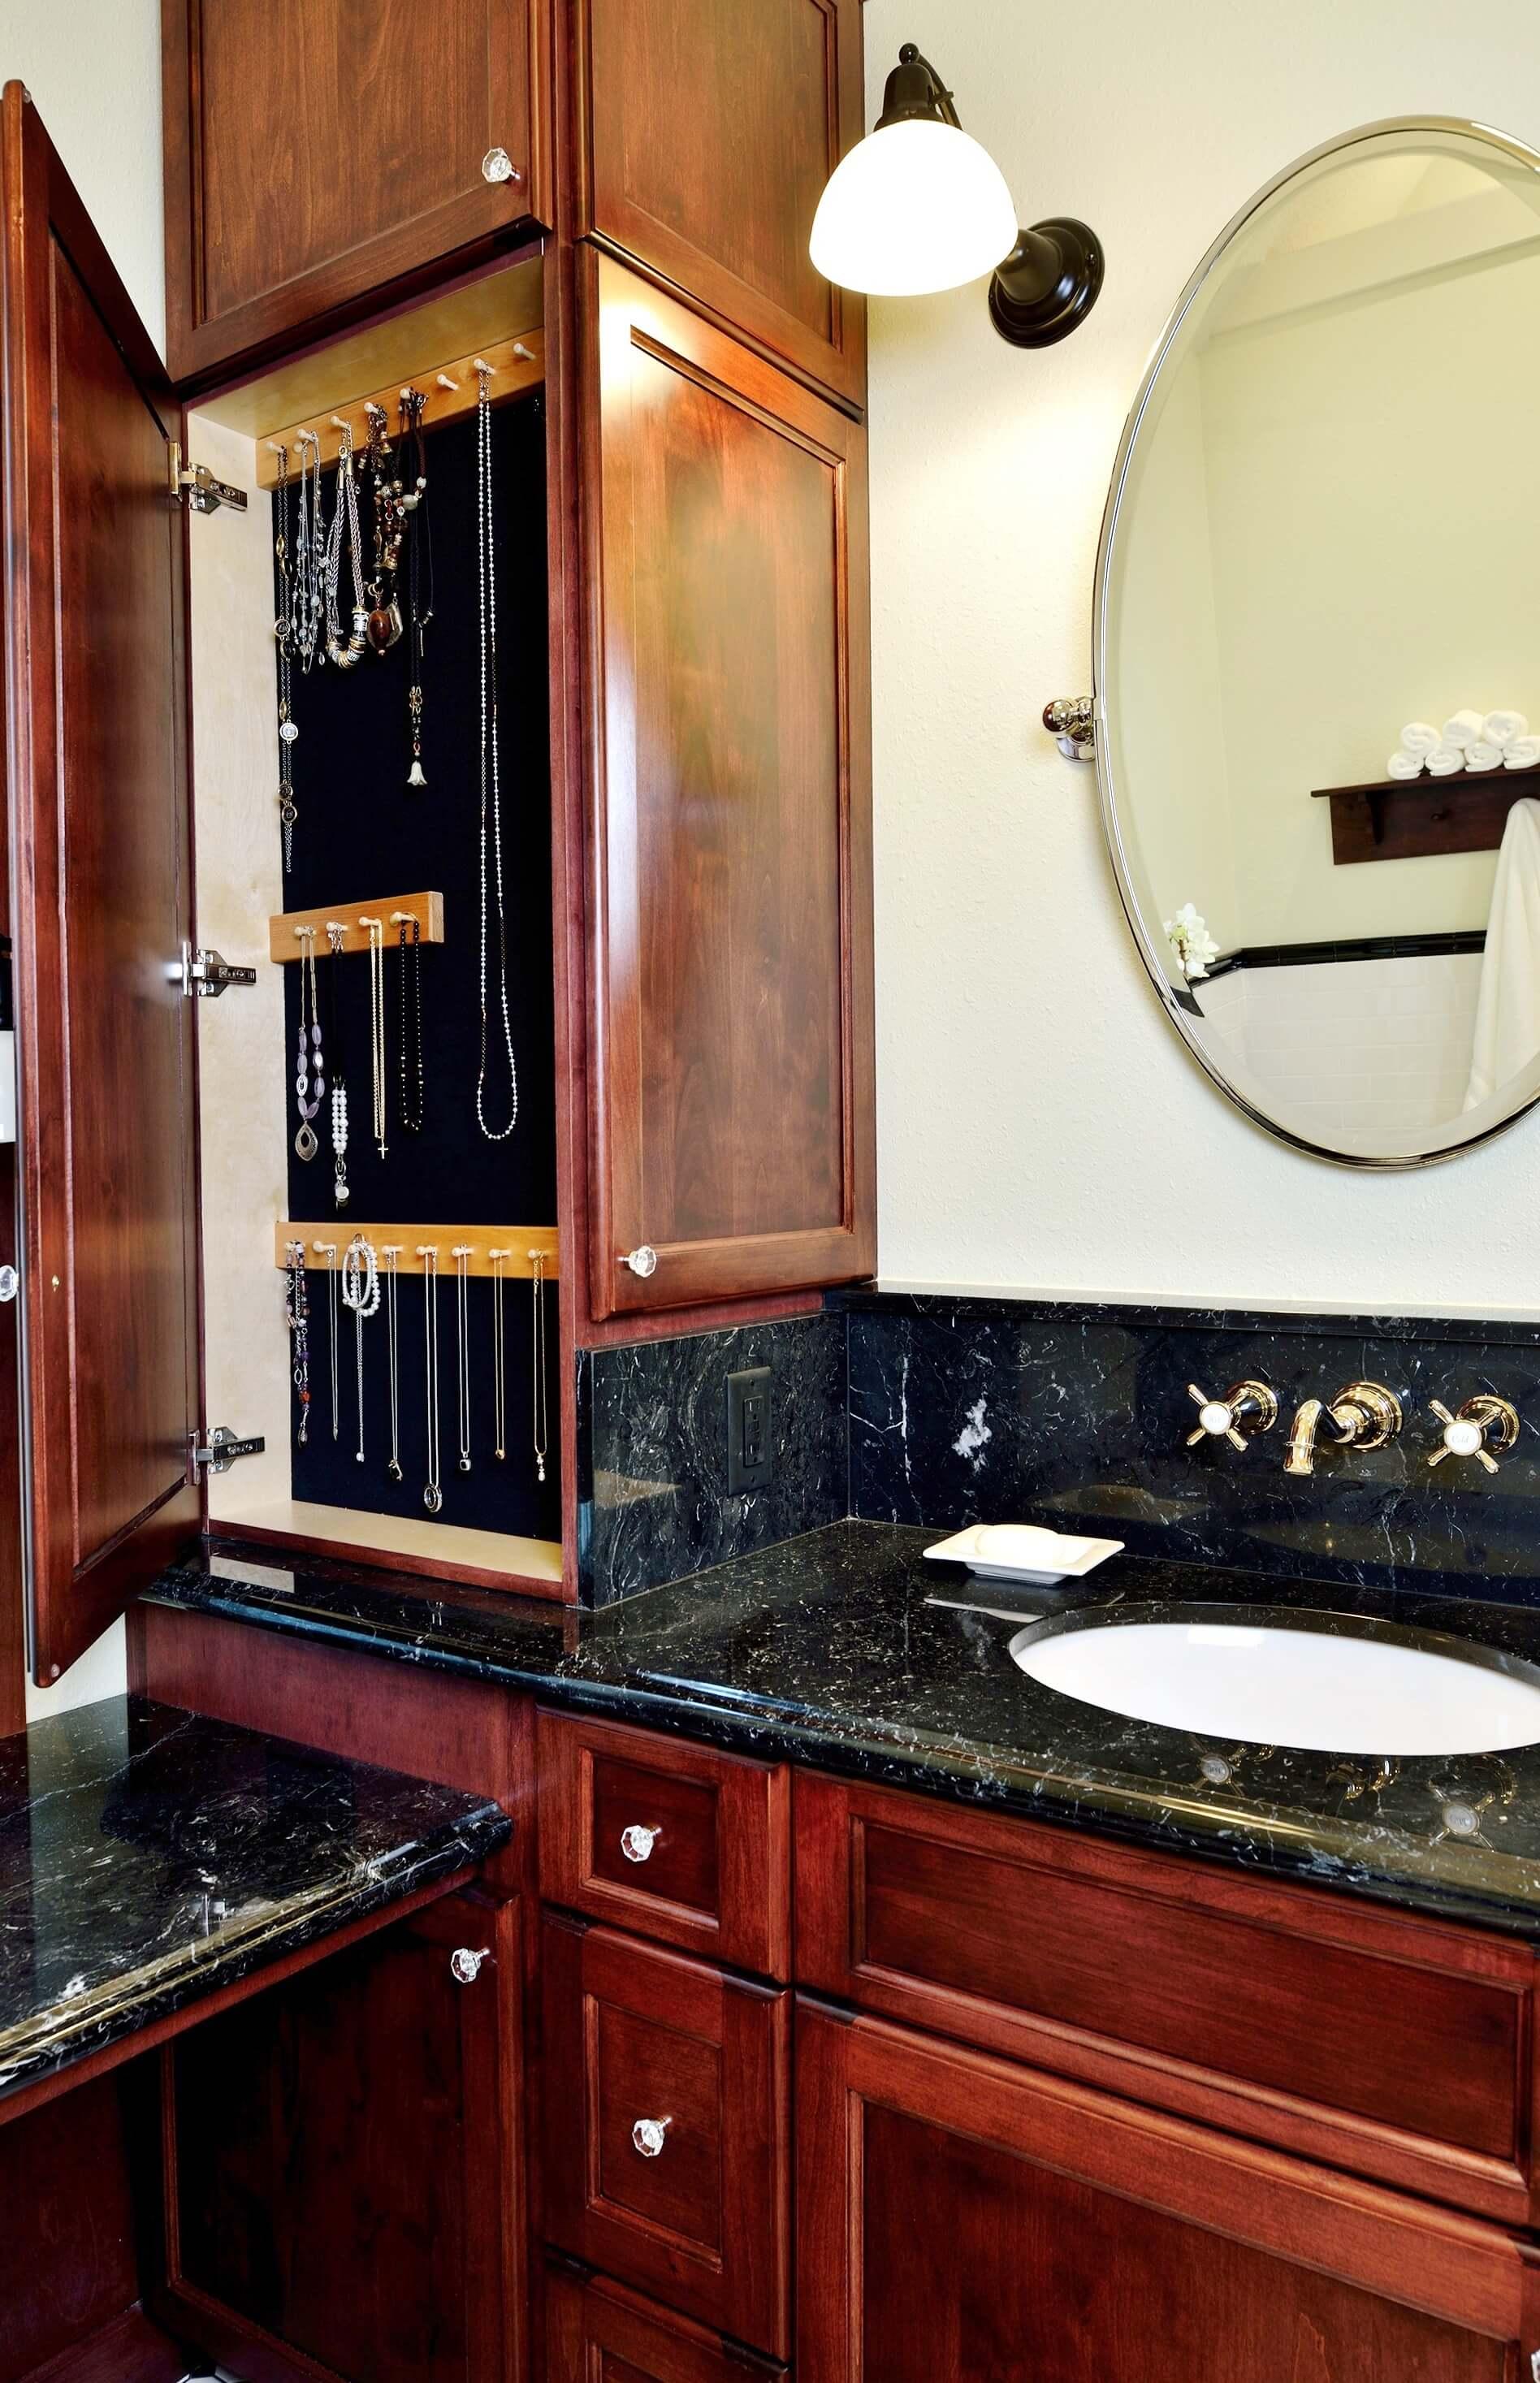 The 12 Inch Deep Upper Bathroom Cabinet